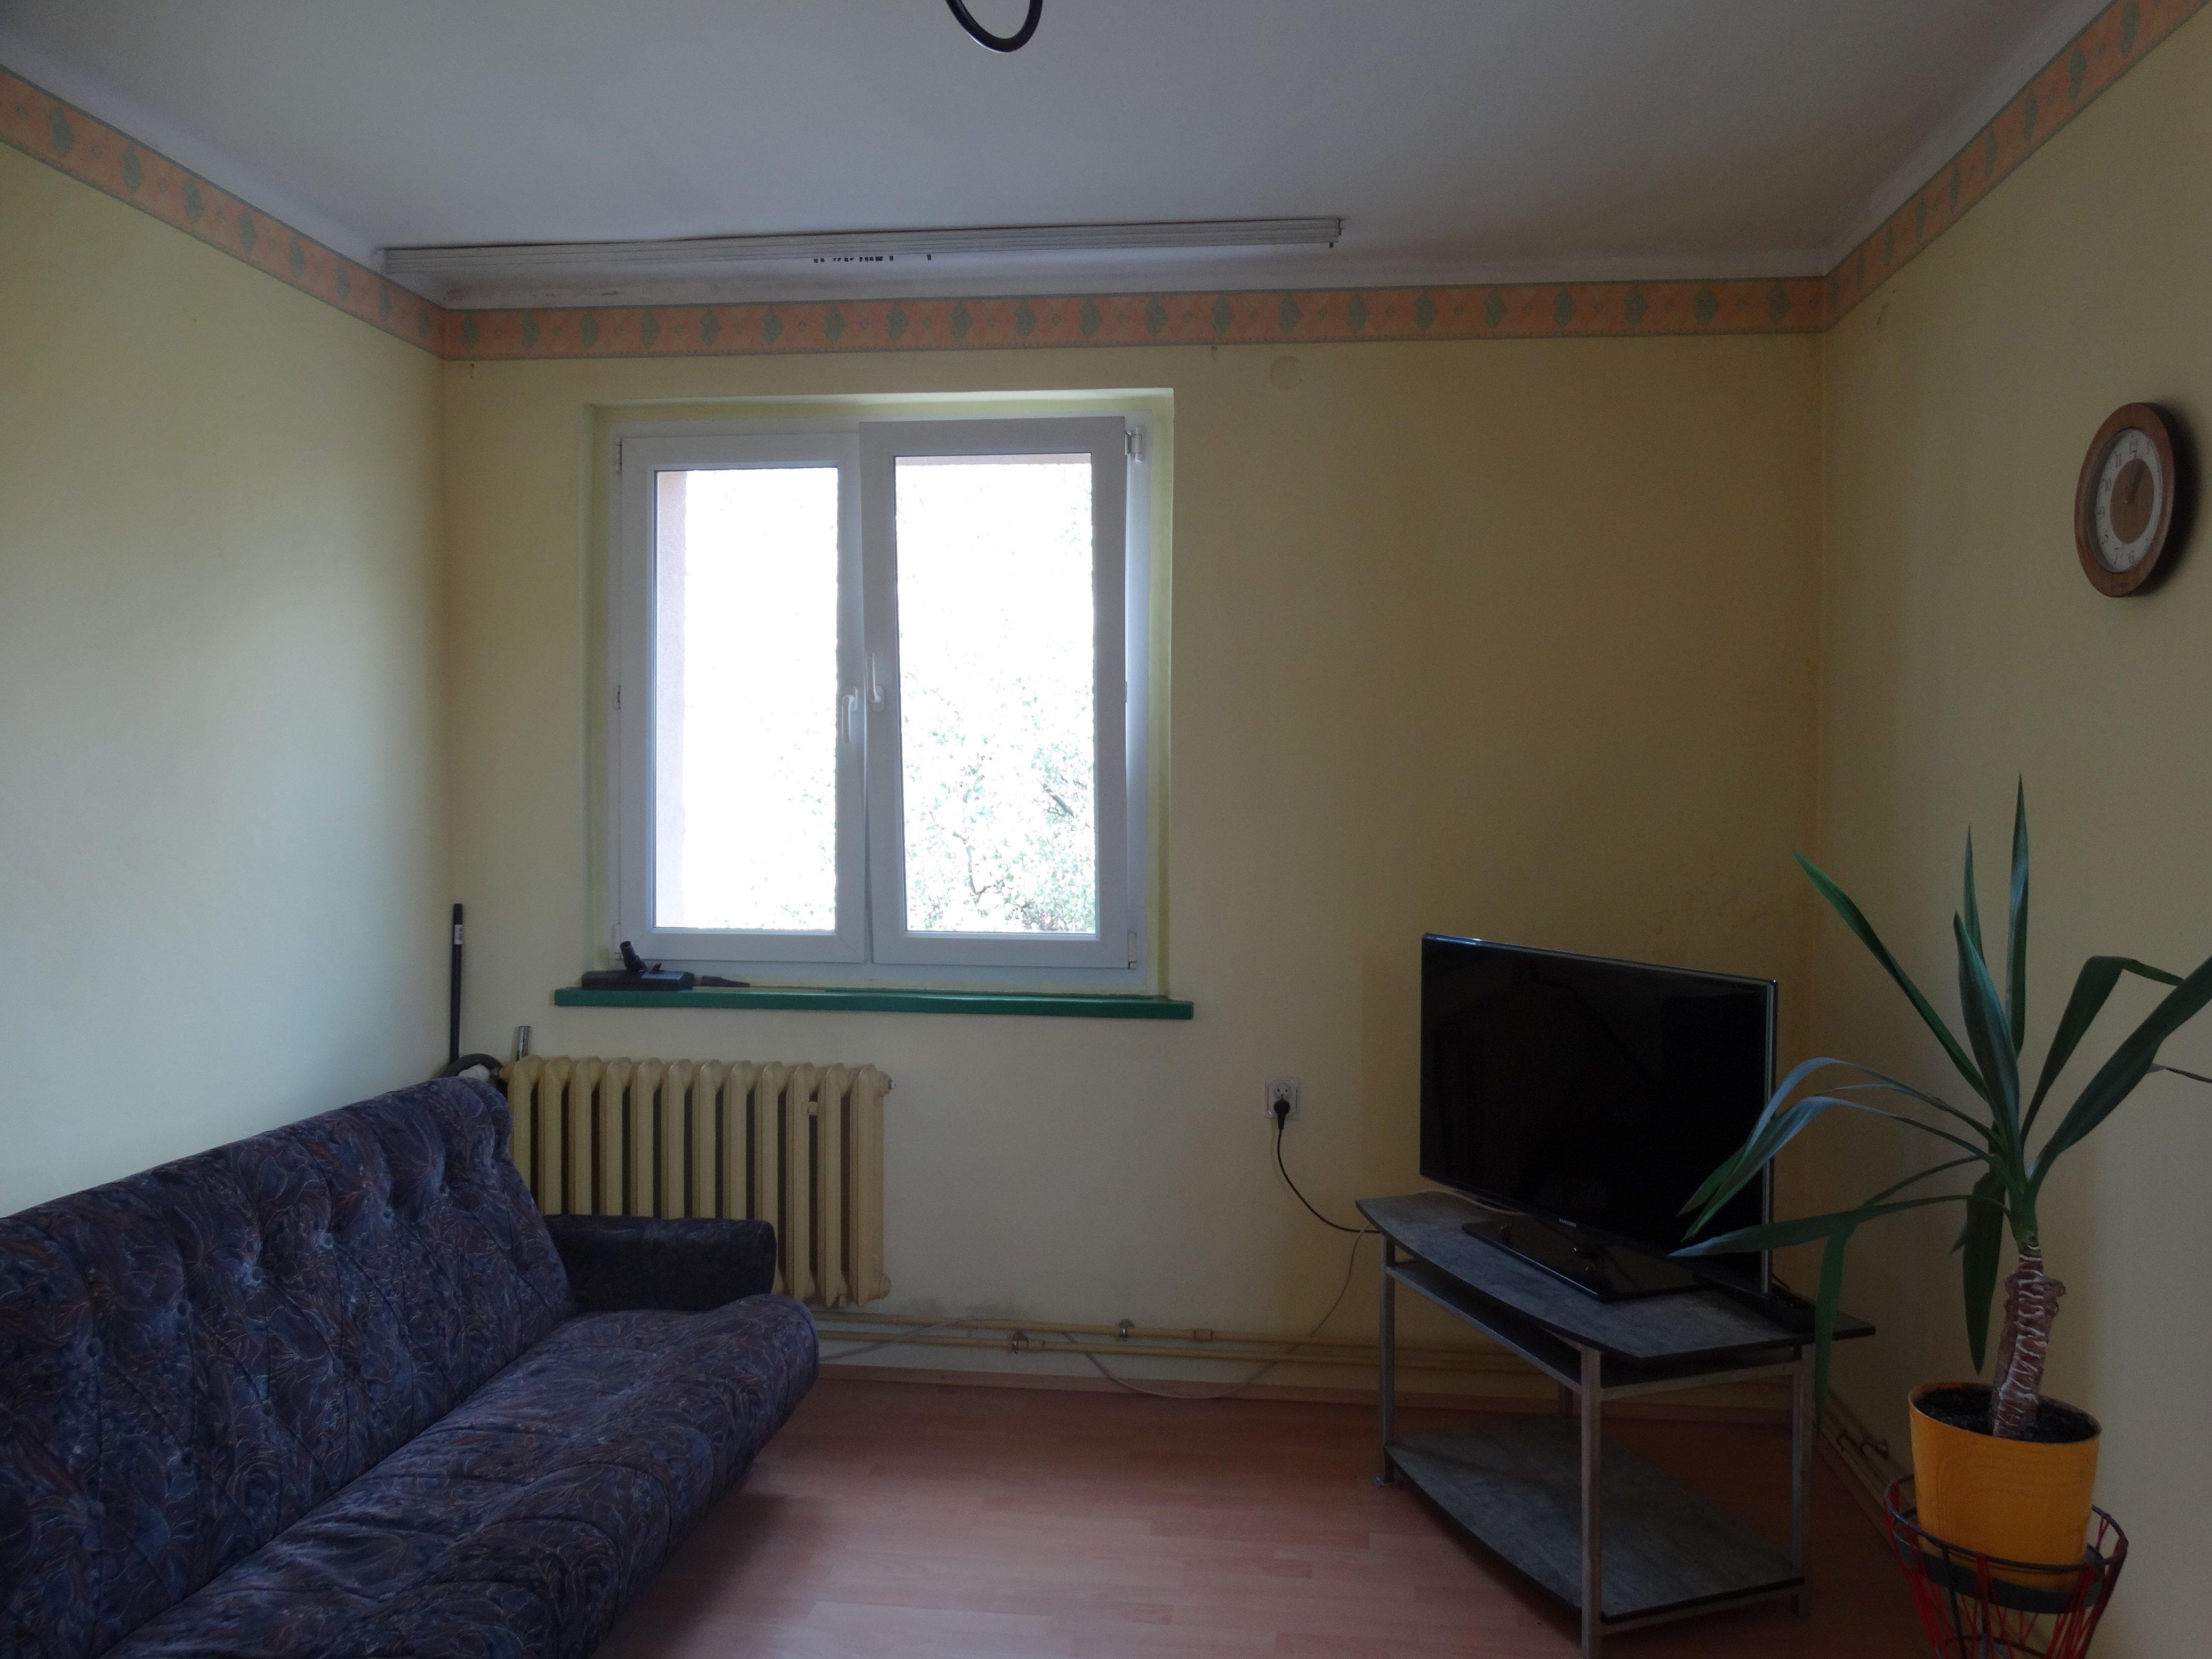 Mieszkanie, 50 m2, Opole - Centrum